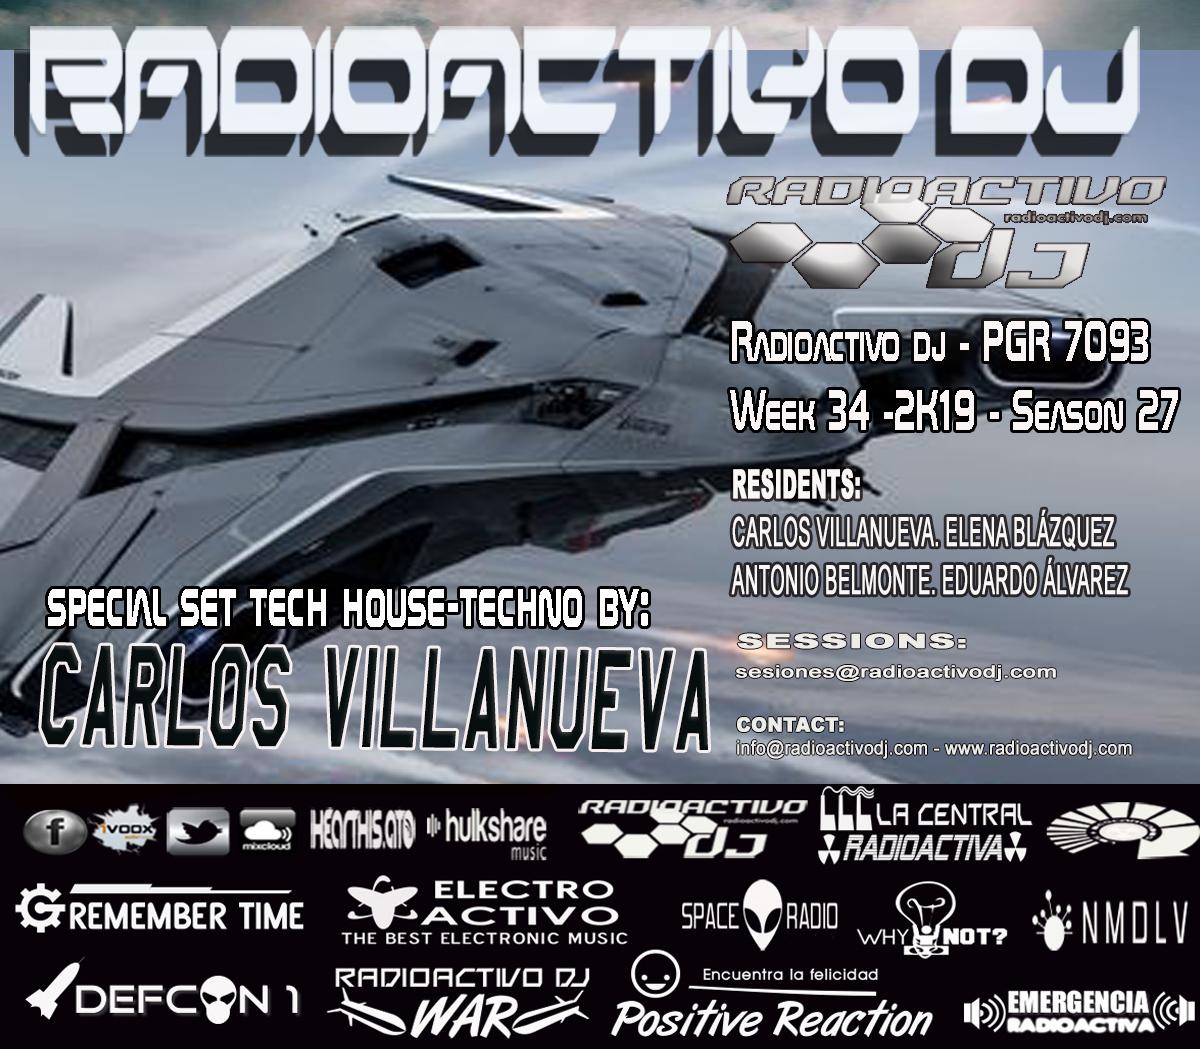 RADIOACTIVO-DJ-34-2019